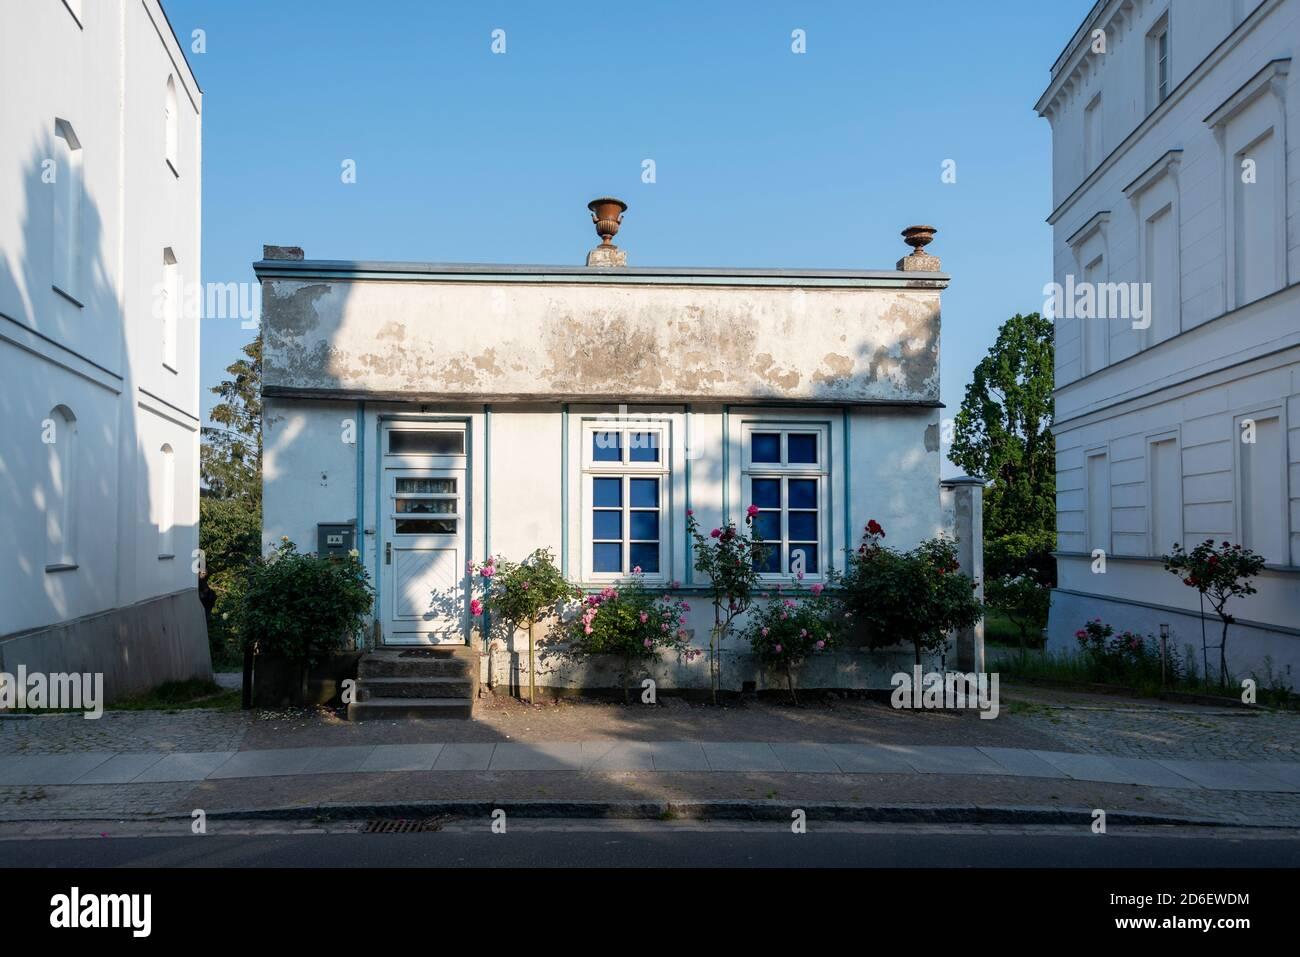 Germany, Mecklenburg-Western Pomerania, Putbus, historic building at Rondellplatz Circus, garden house Stock Photo